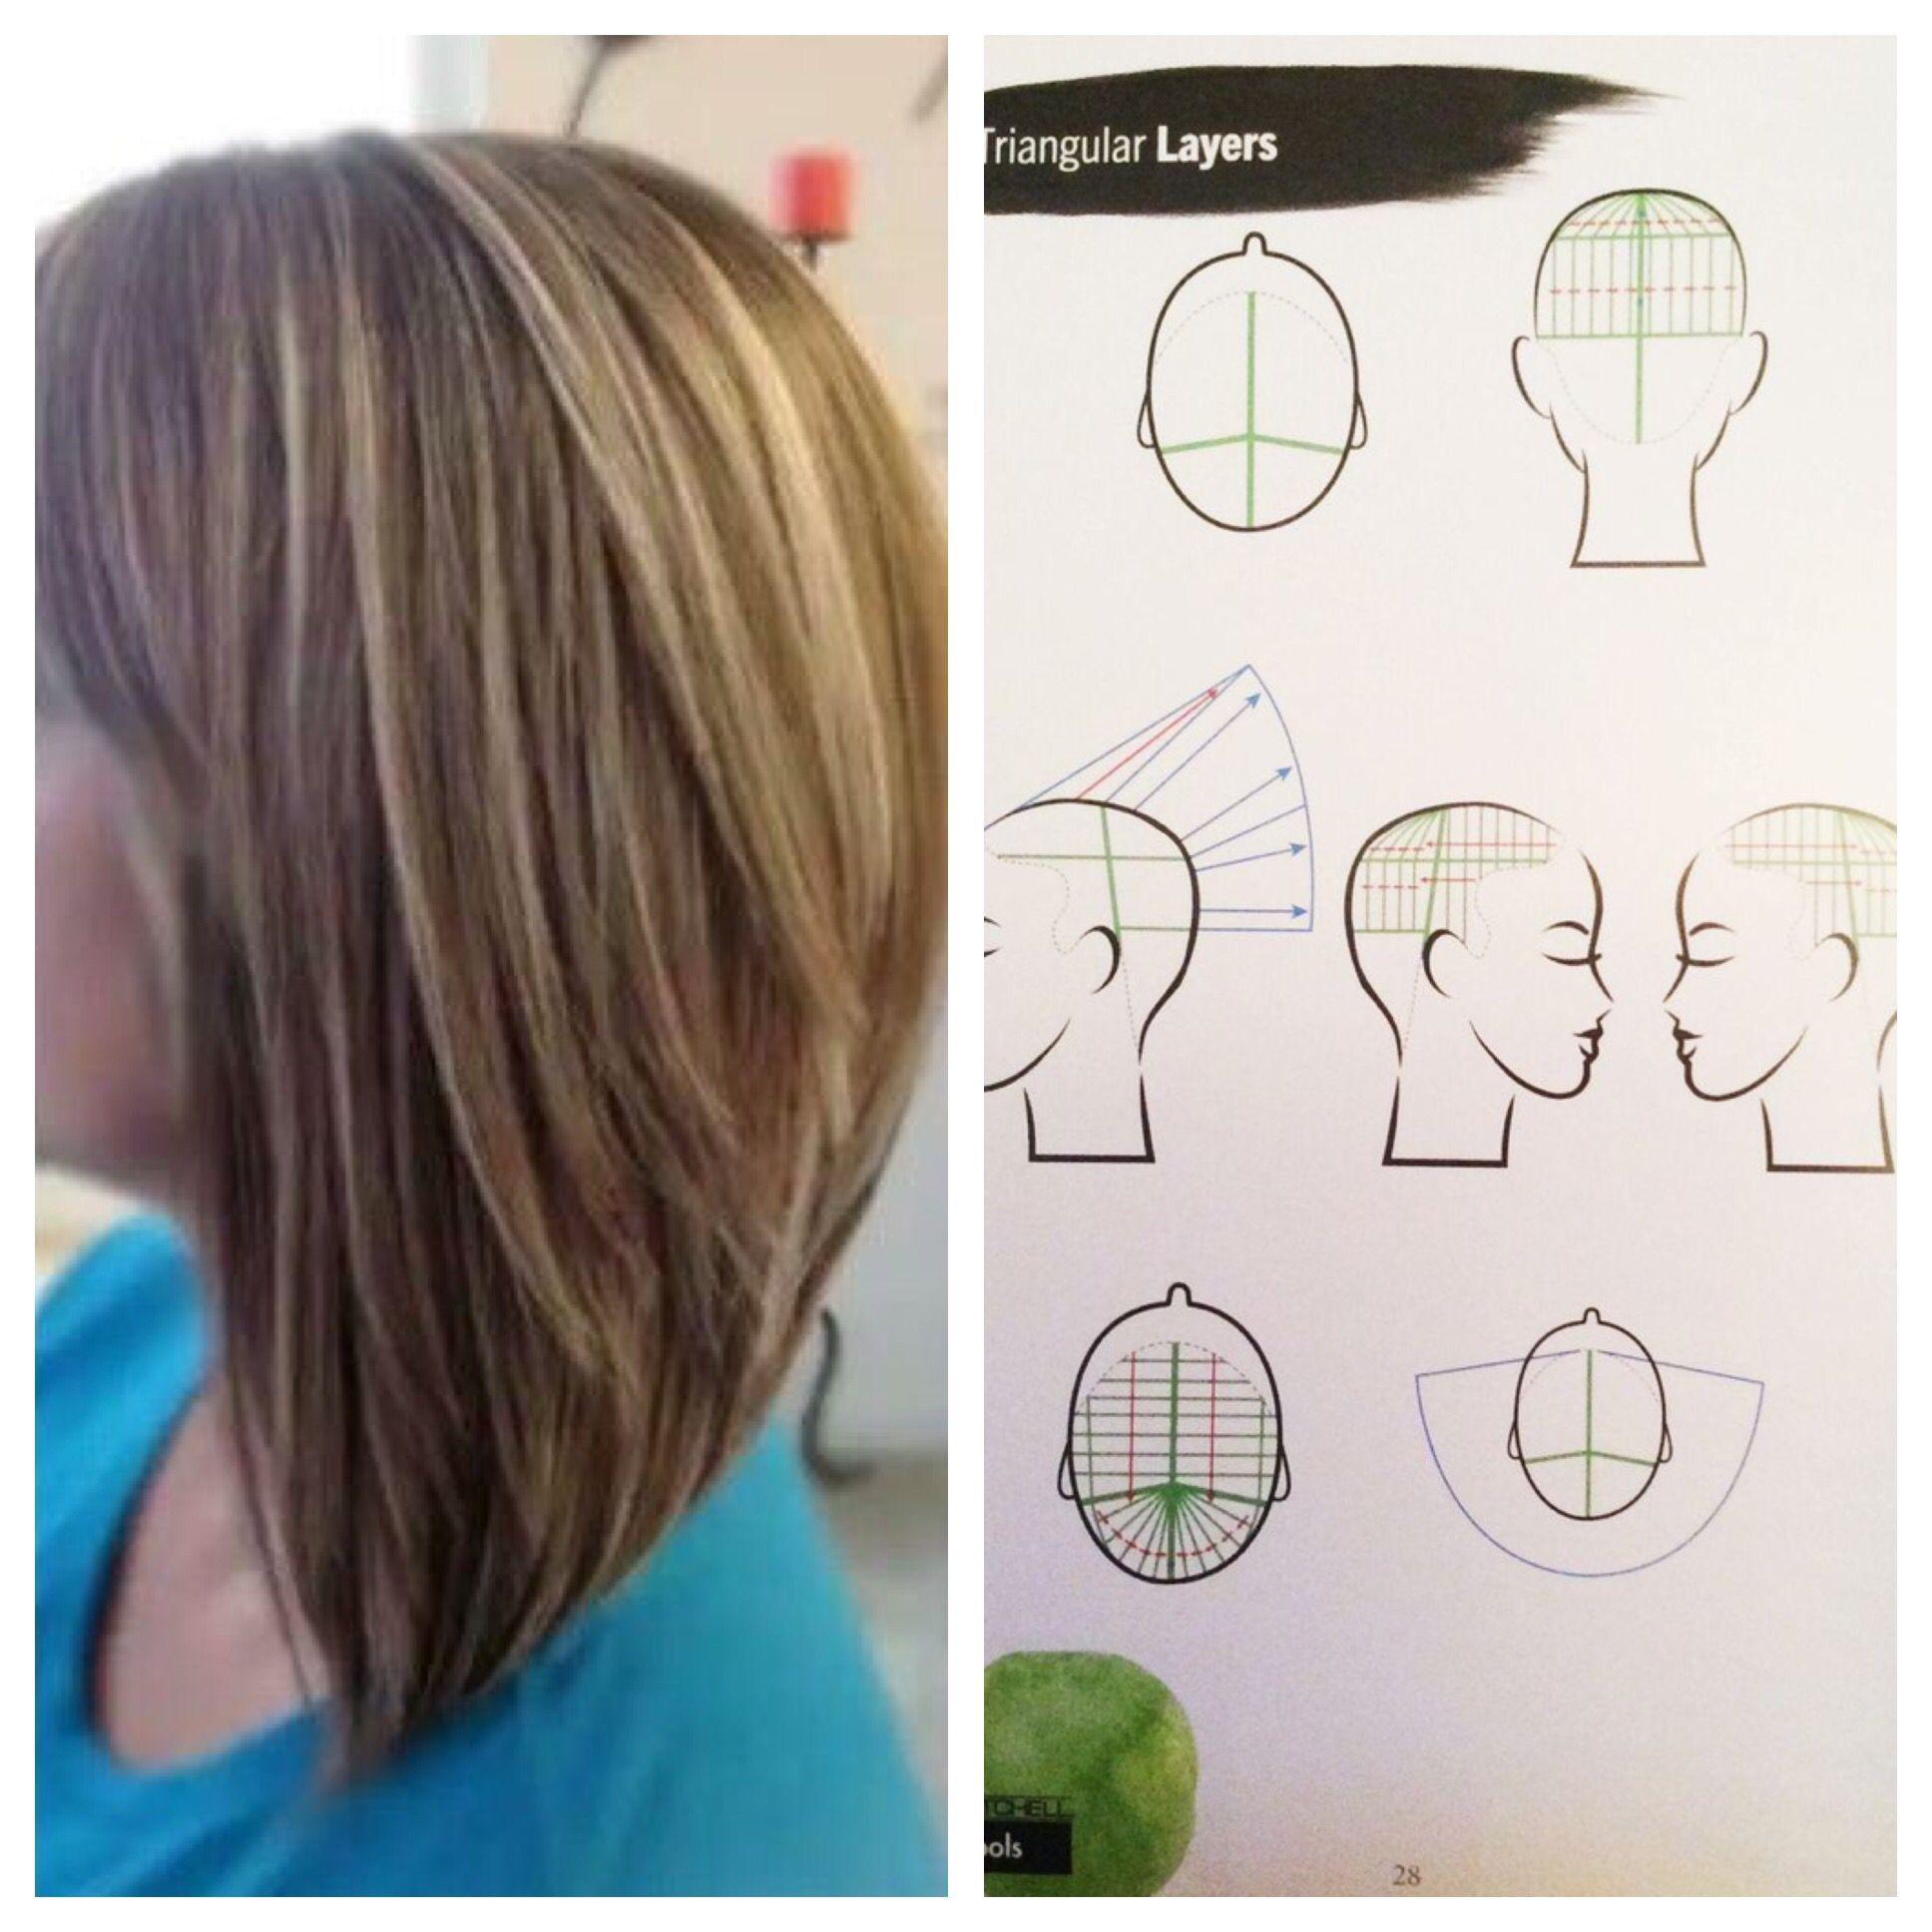 180 degree haircut diagram how to tie a tie diagram wiring diagrams 180 degree haircut diagram how to tie a tie diagram [ 1936 x 1936 Pixel ]